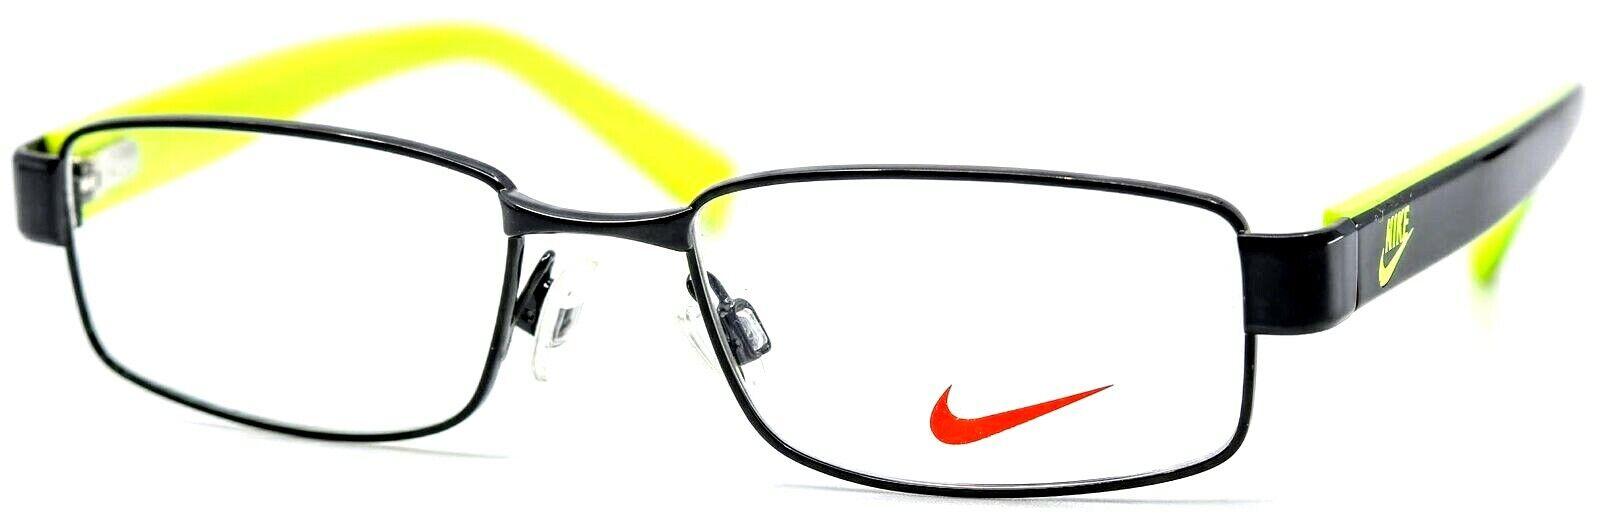 Nike Kids 5571 010 Black Volt Yellow Boys Girls ...